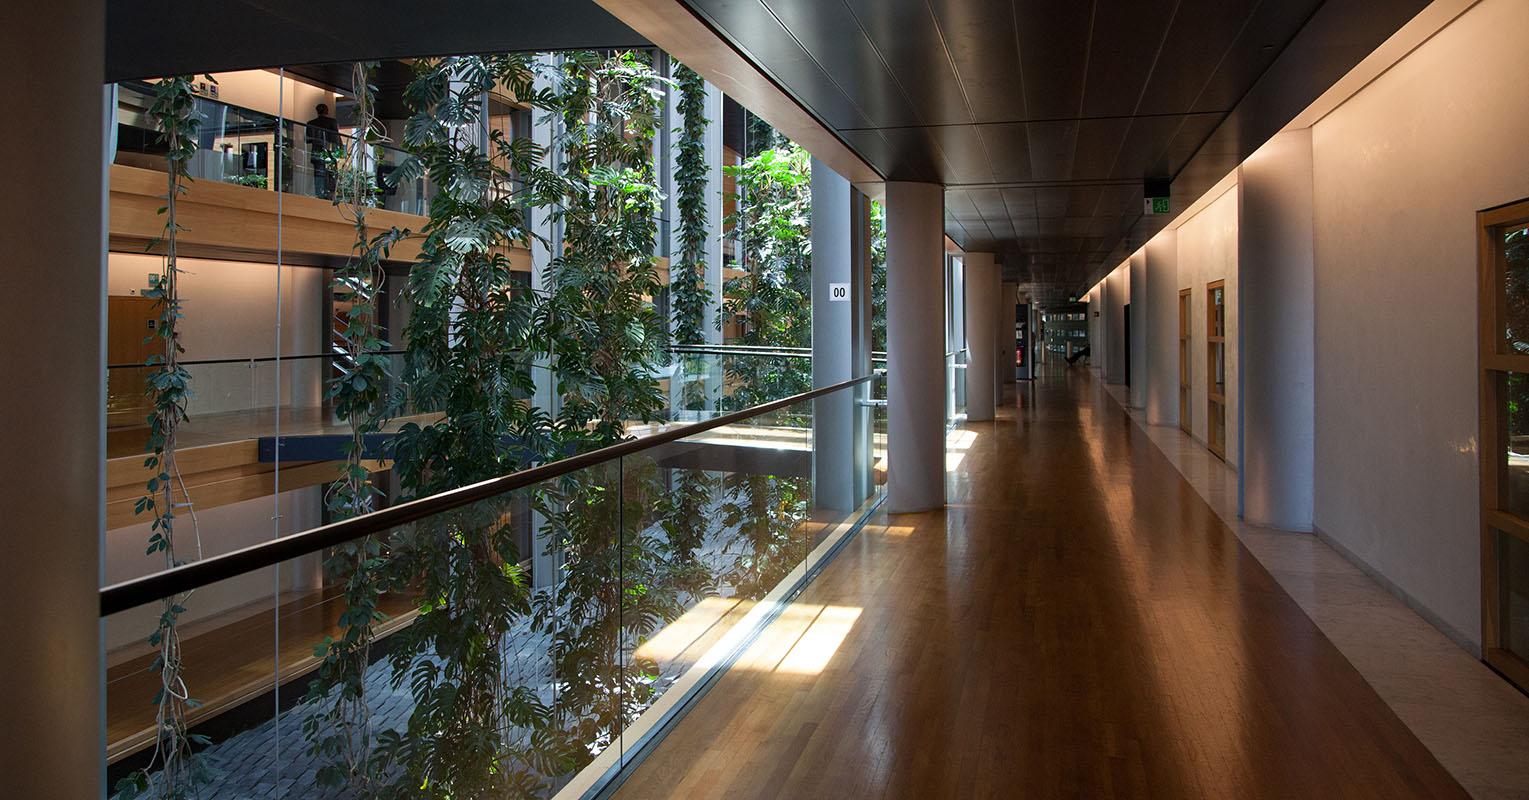 Summer season at the European Parliament in Strasbourg - LOW corridors